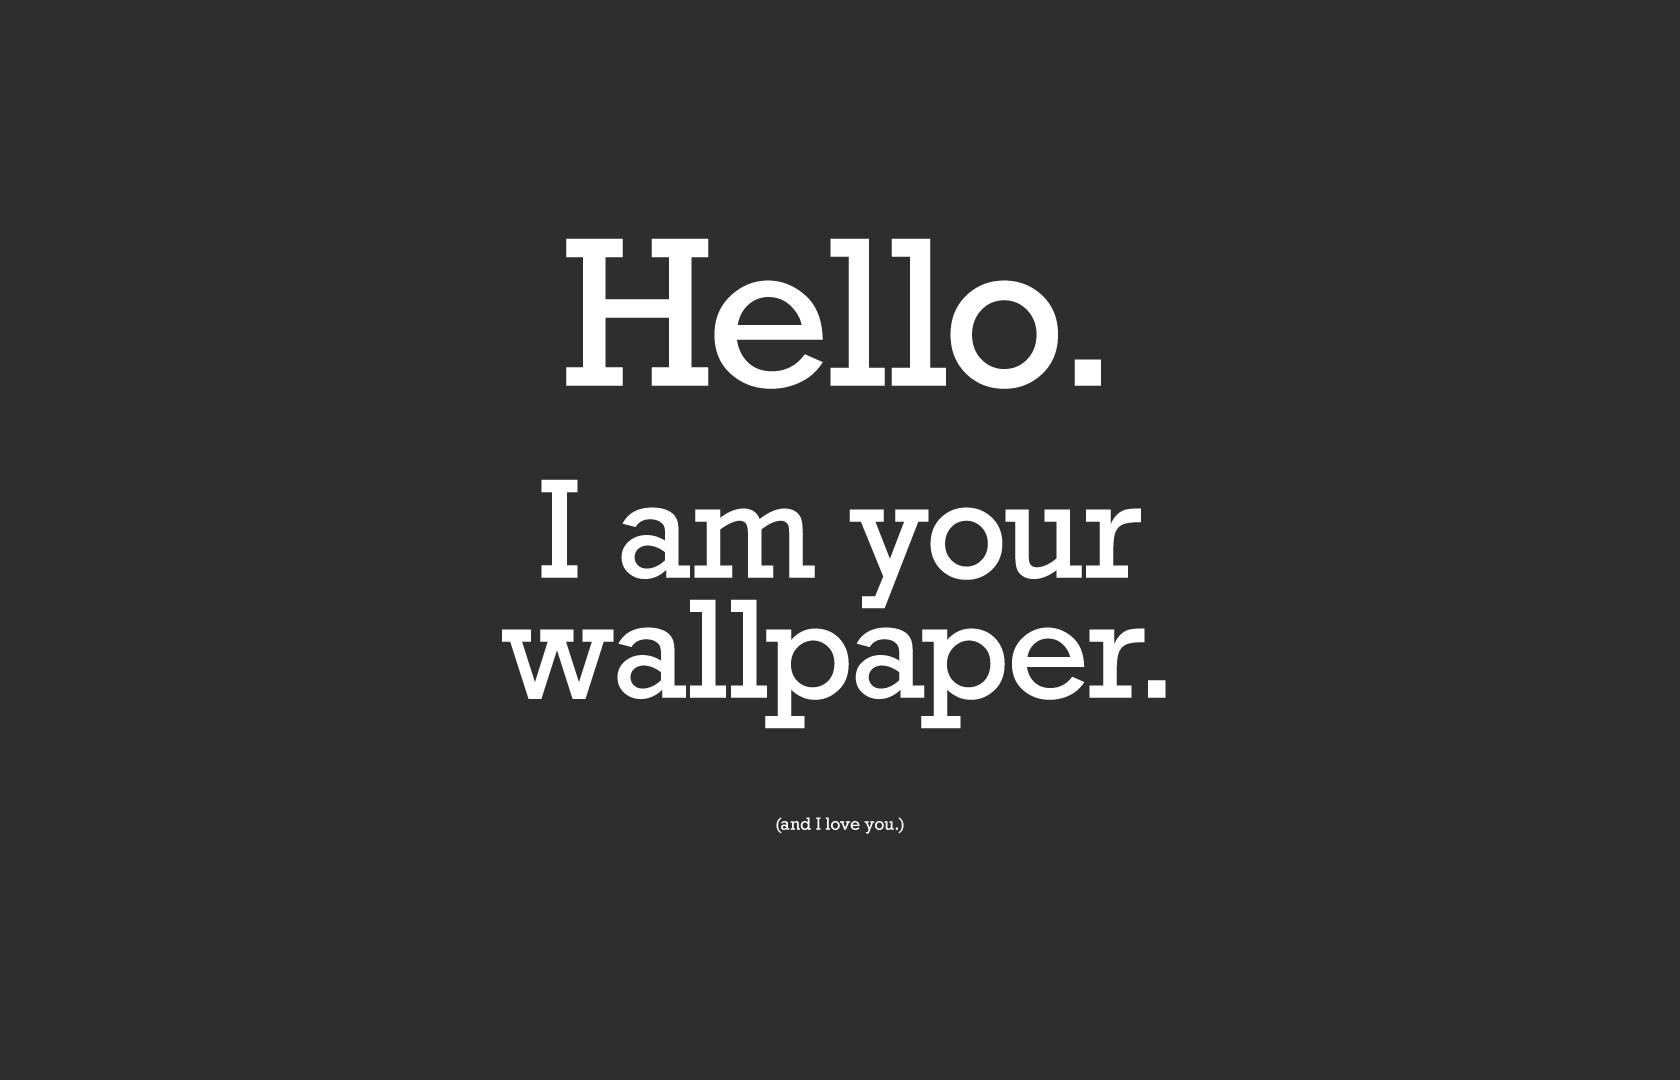 Hello Wallpaper Background